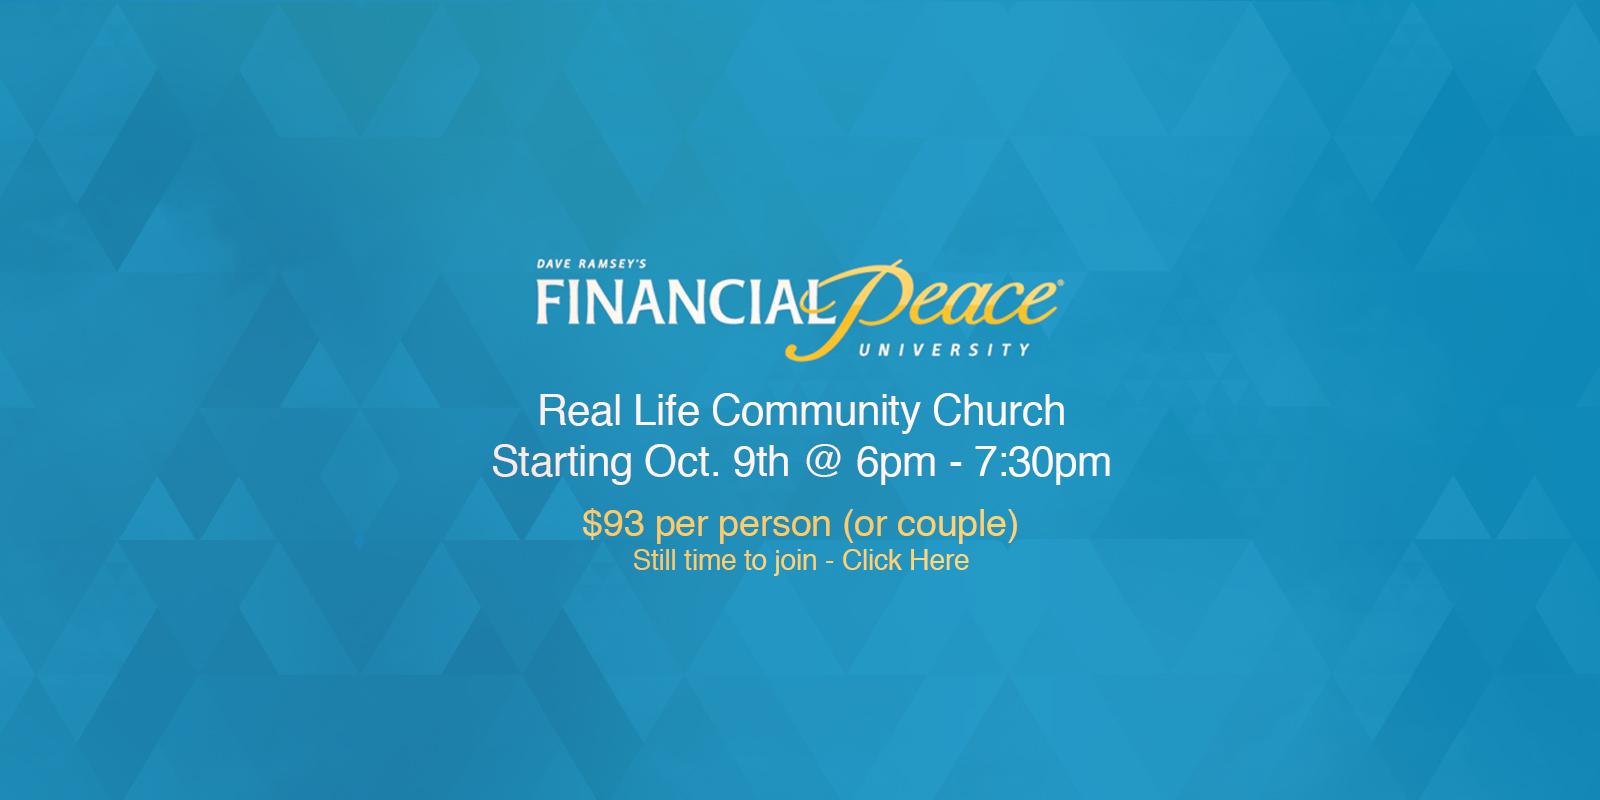 Financial Peace University at Real Life Community Church starting October 9th at 6pm